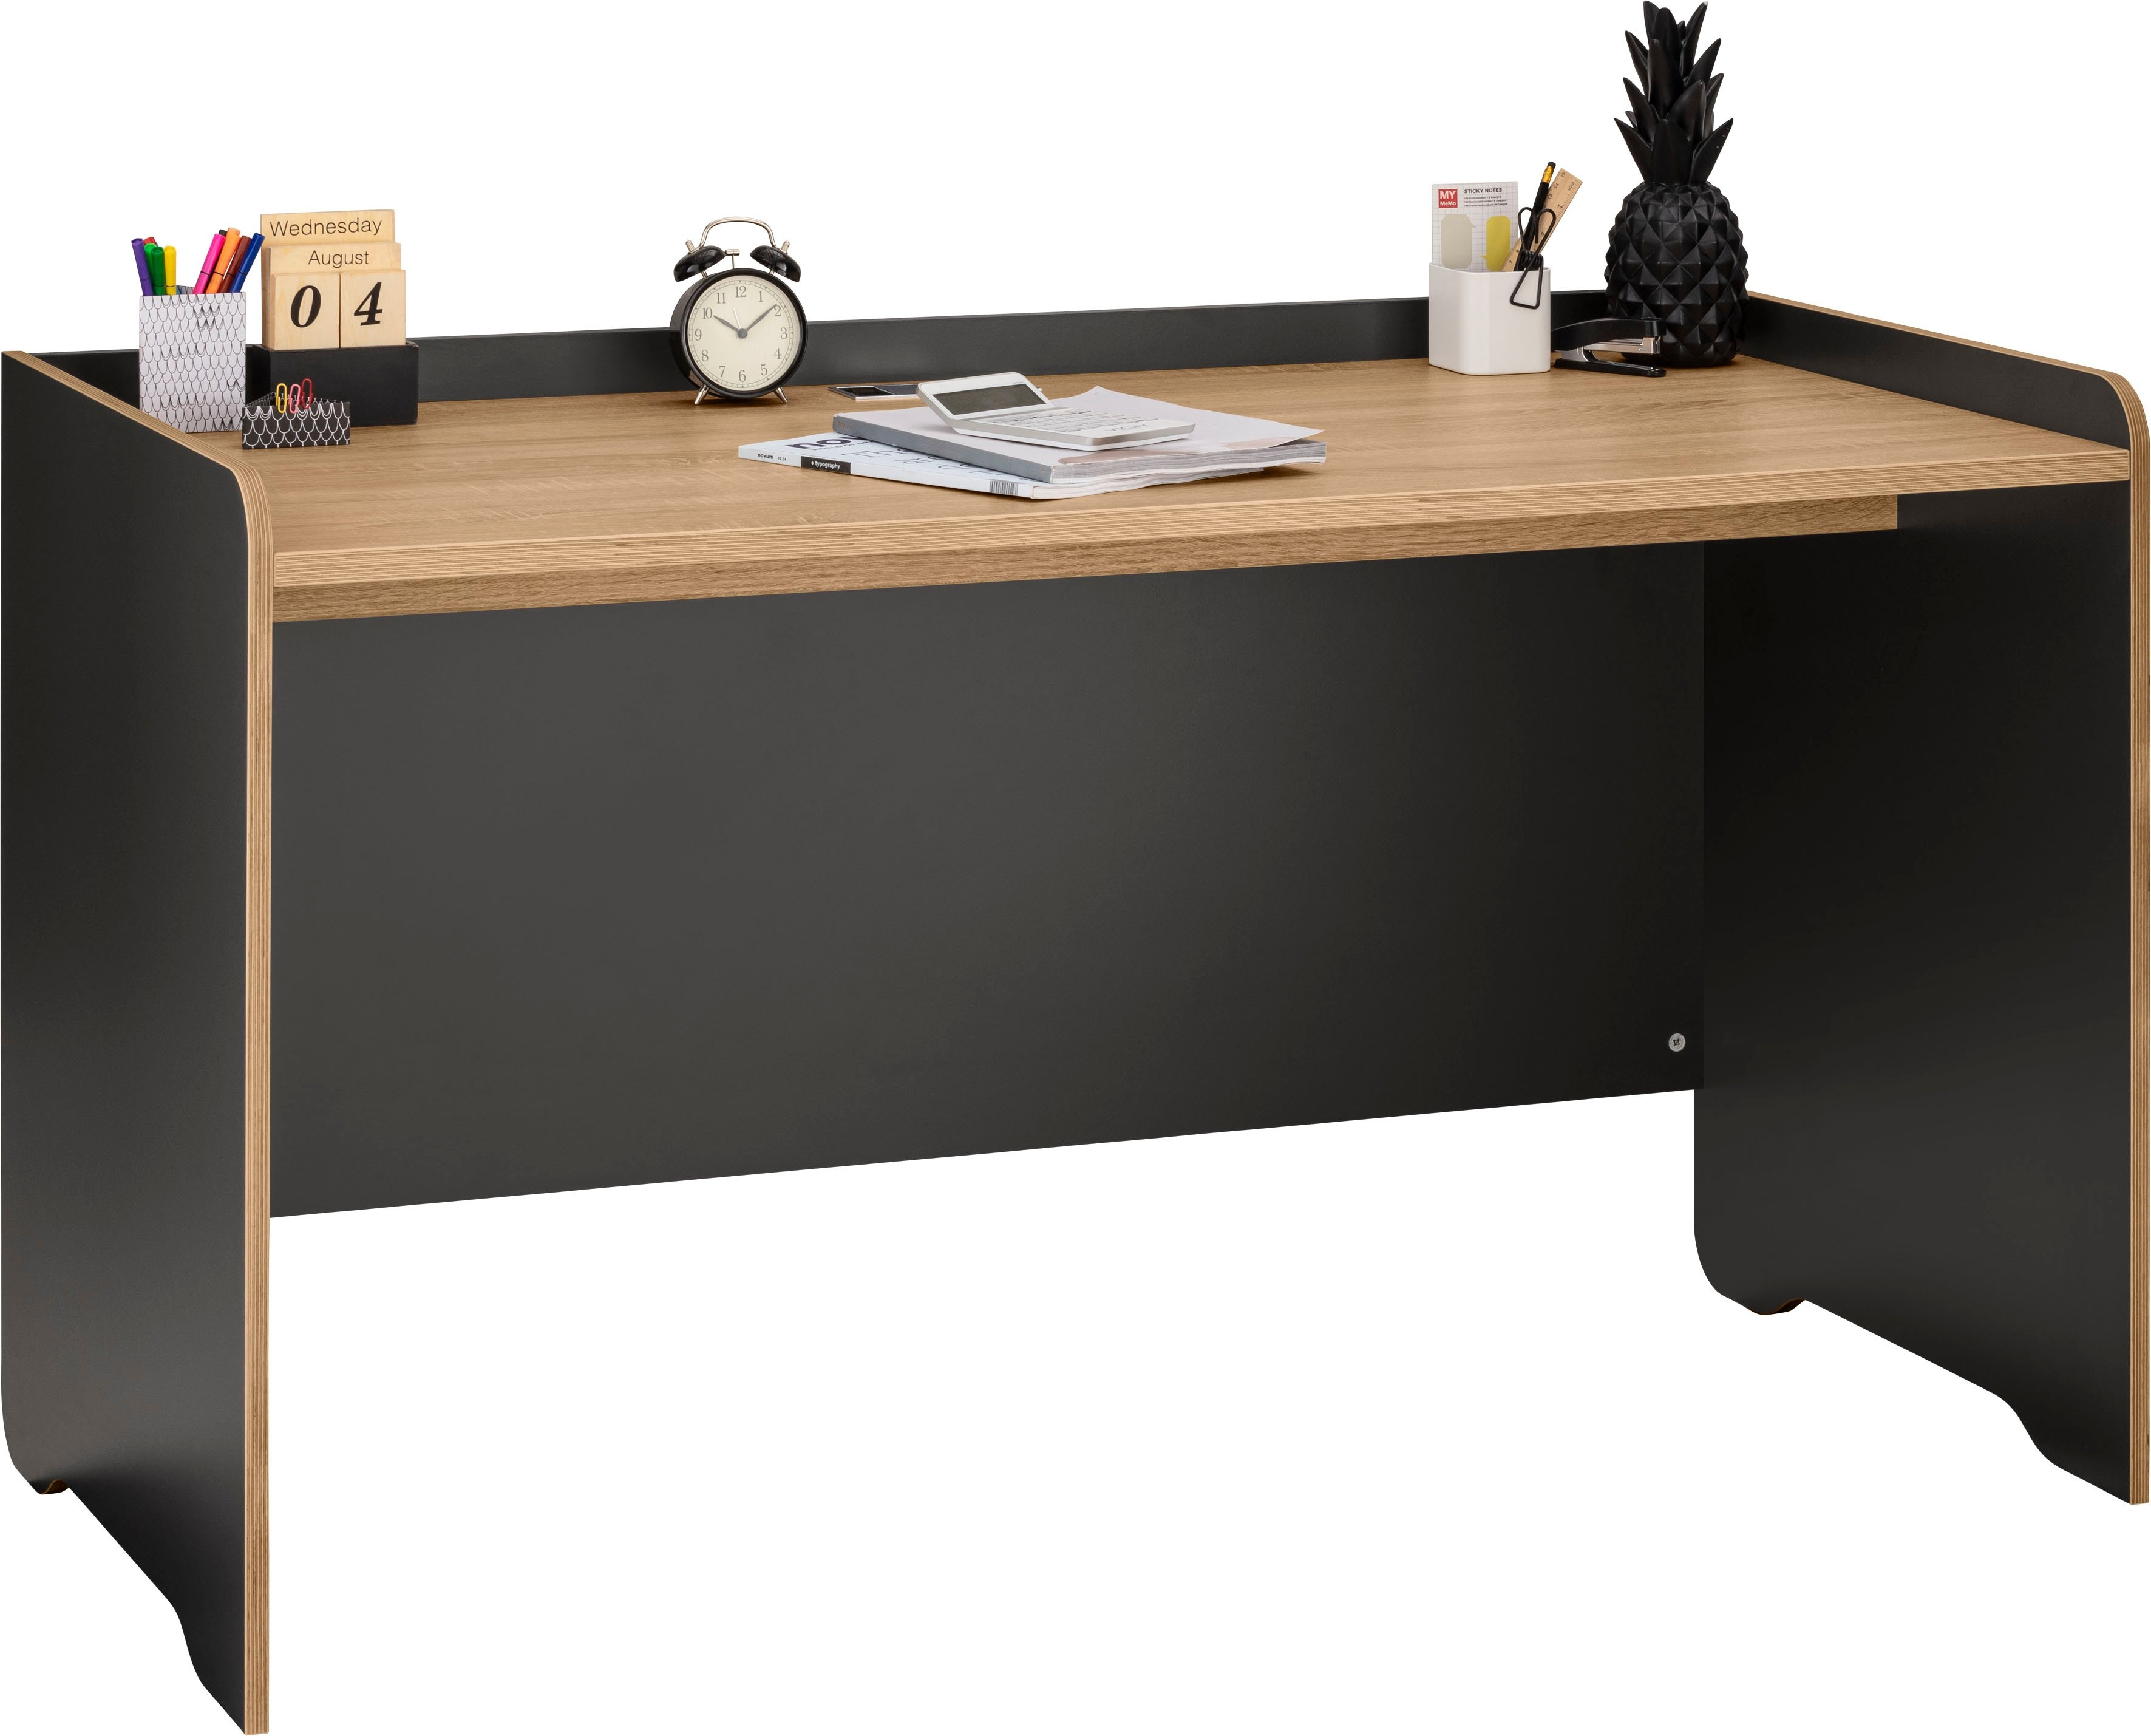 Places of Style bureau »Ergil« goedkoop op otto.nl kopen